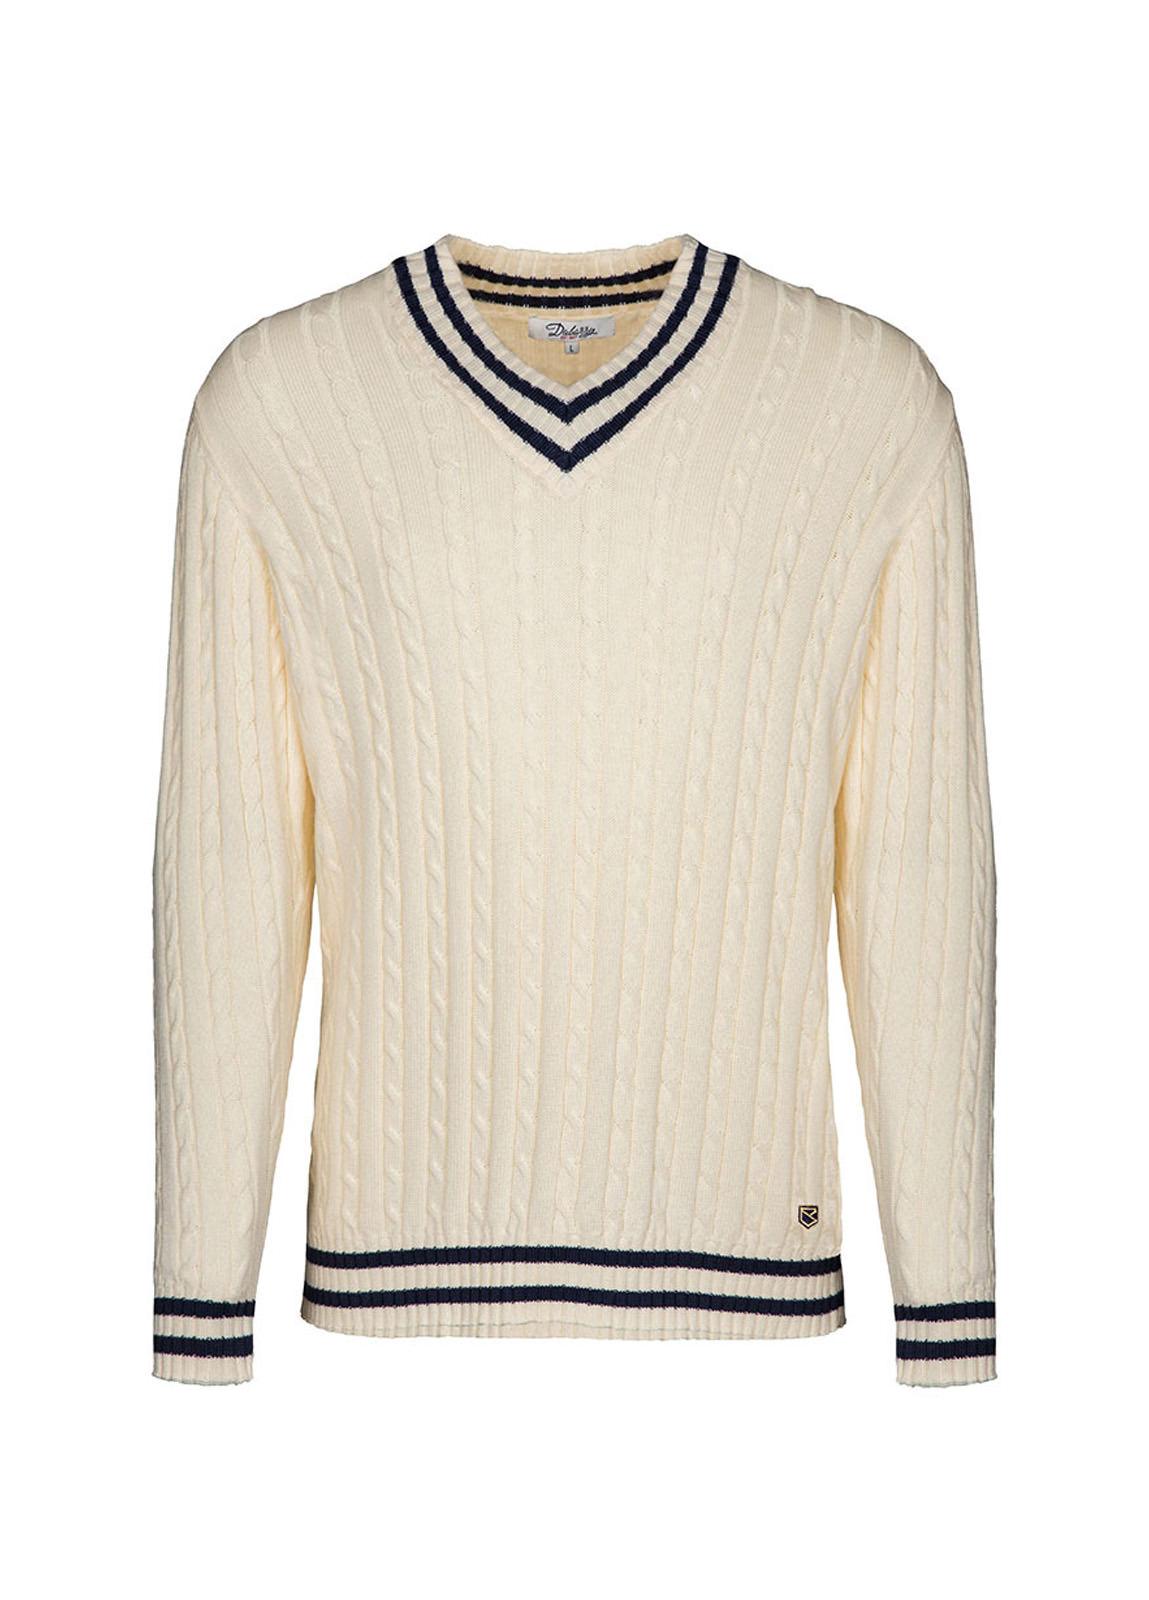 Dubarry_ Rosbeg Sweater - Sail White_Image_2